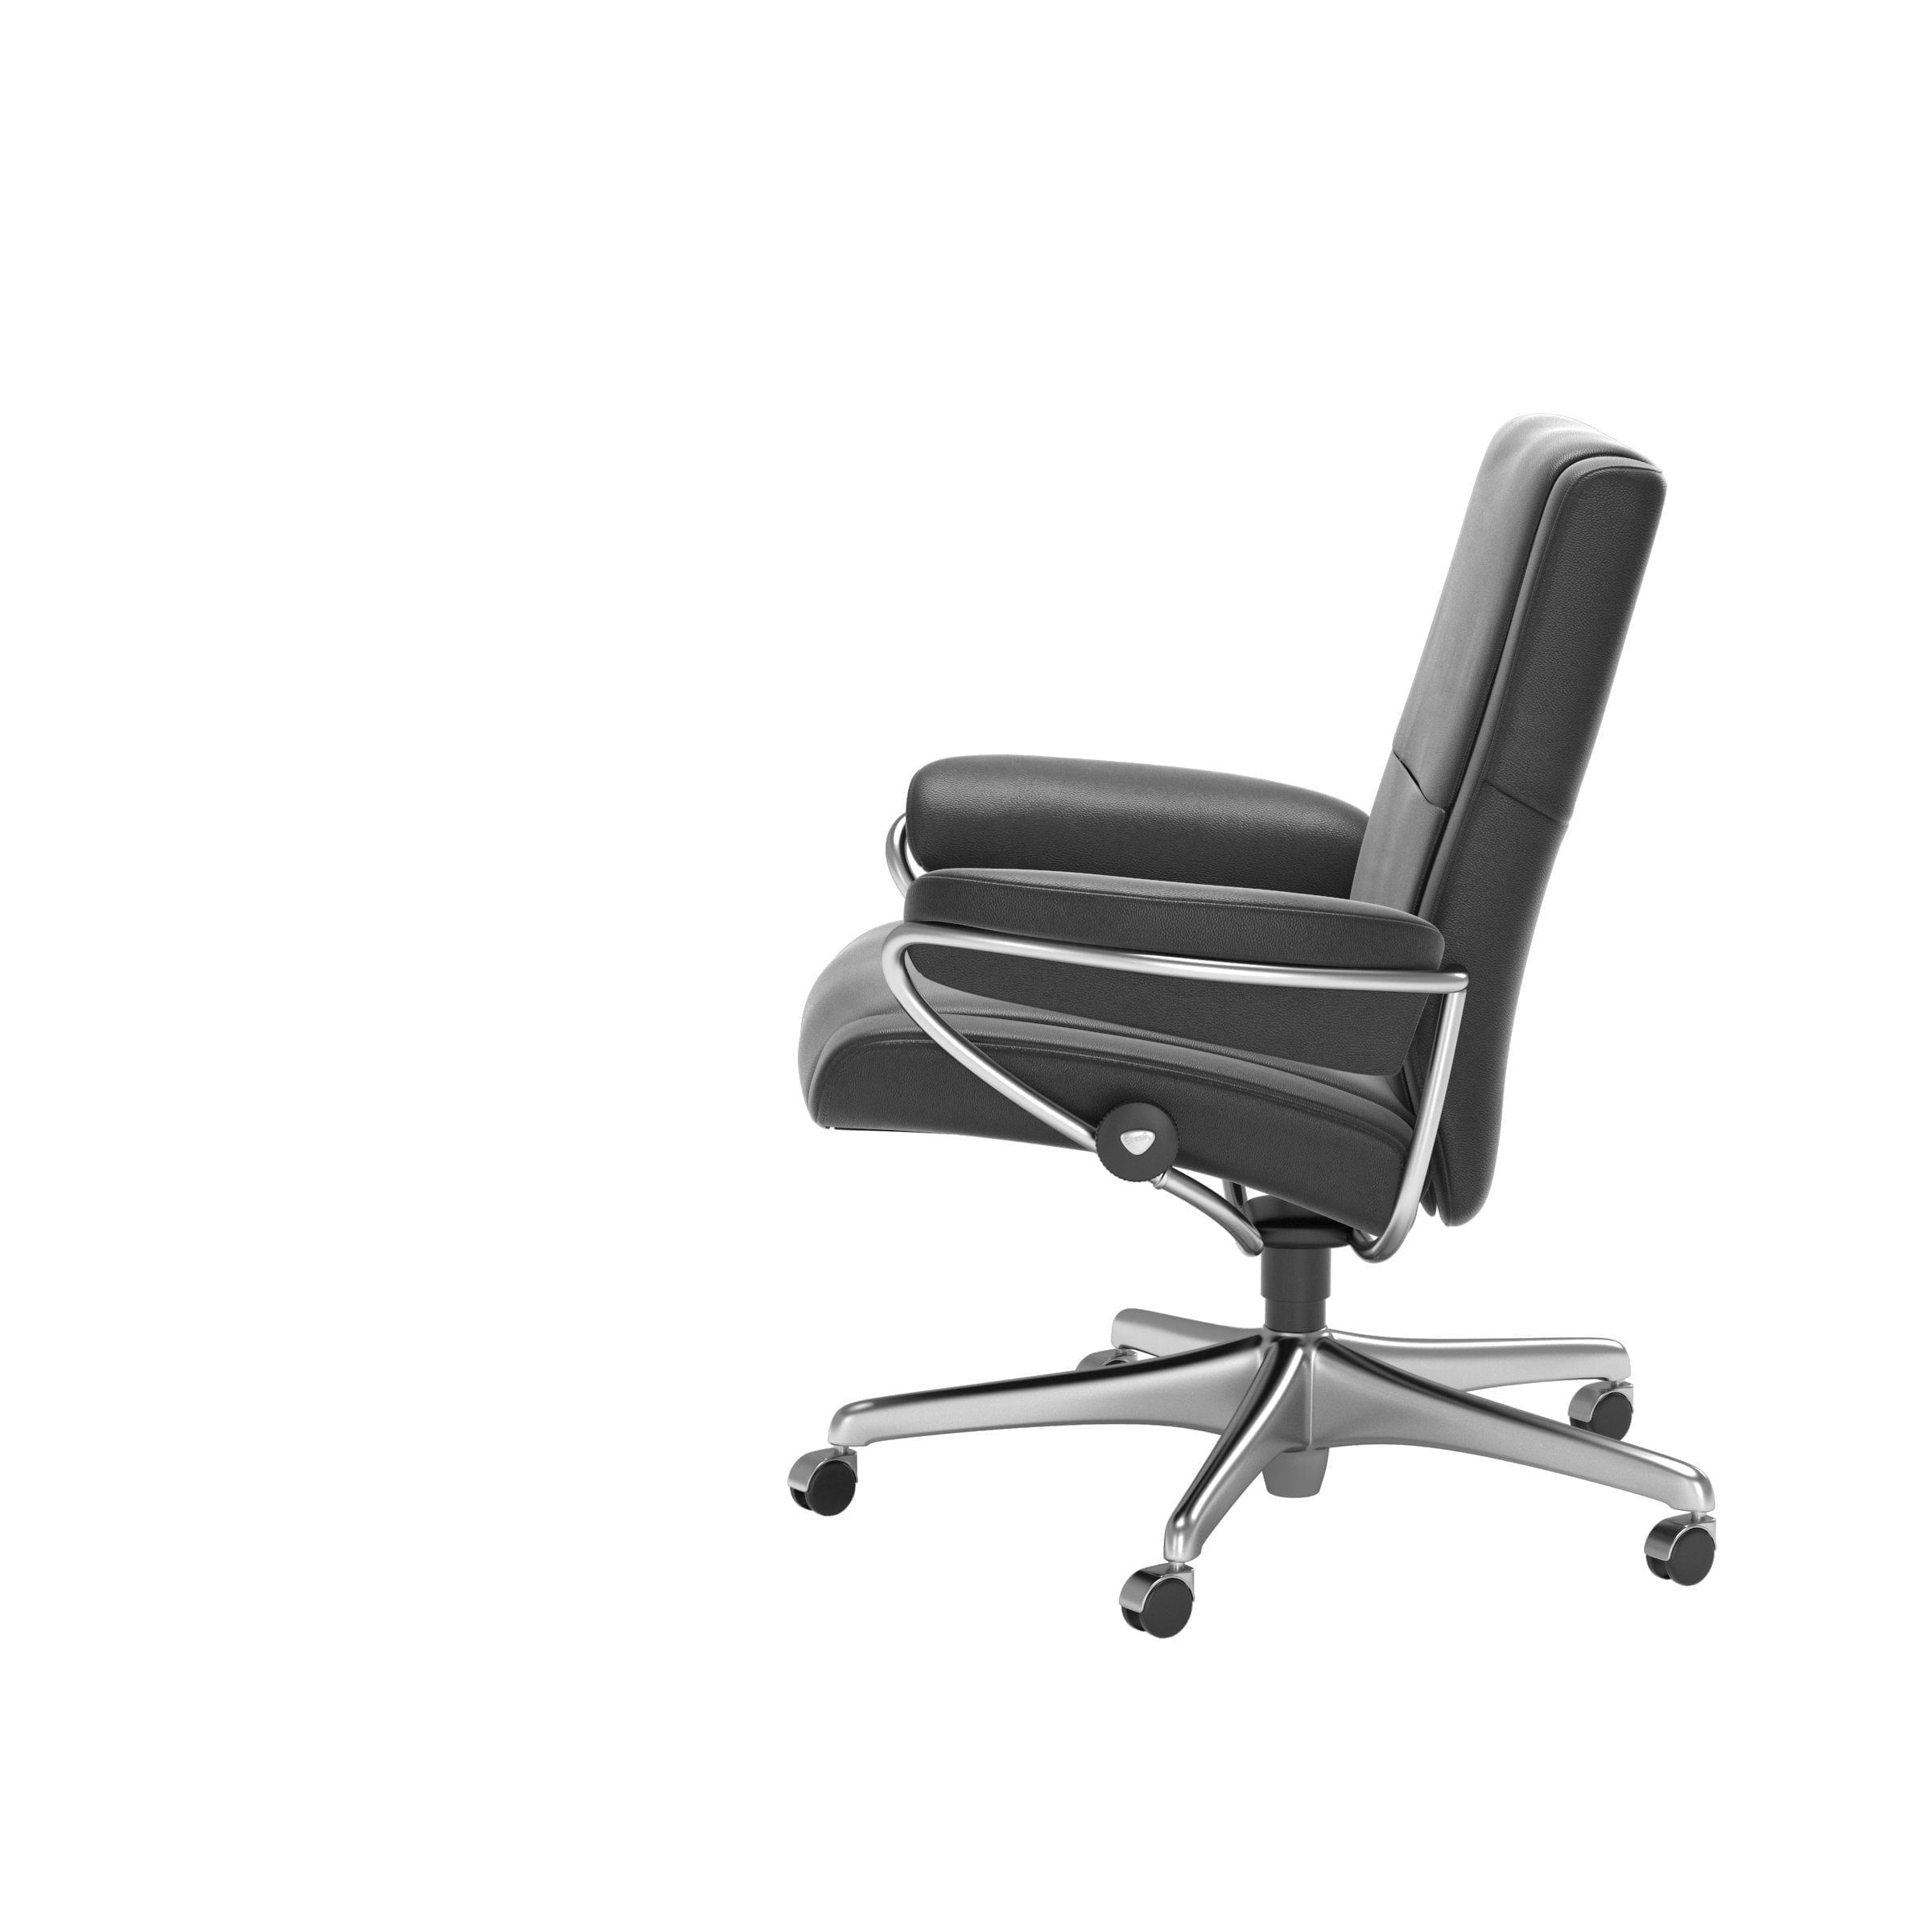 Office Chair Low Back Paris Stressless 4